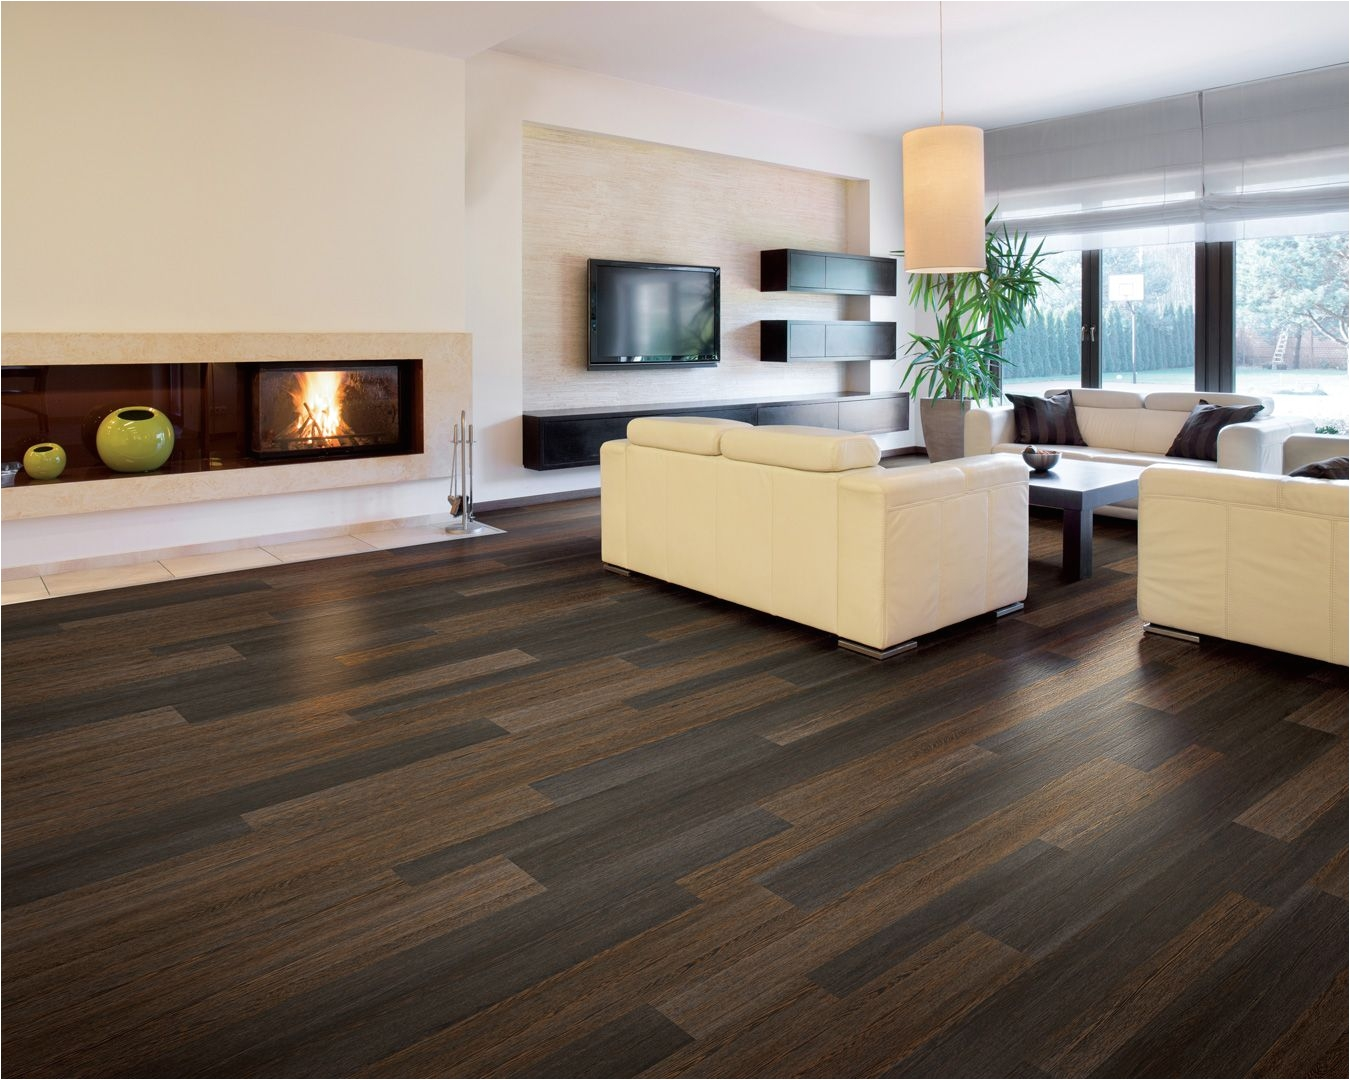 vinyl plank flooring coretec plus hd xl enhanced design floors